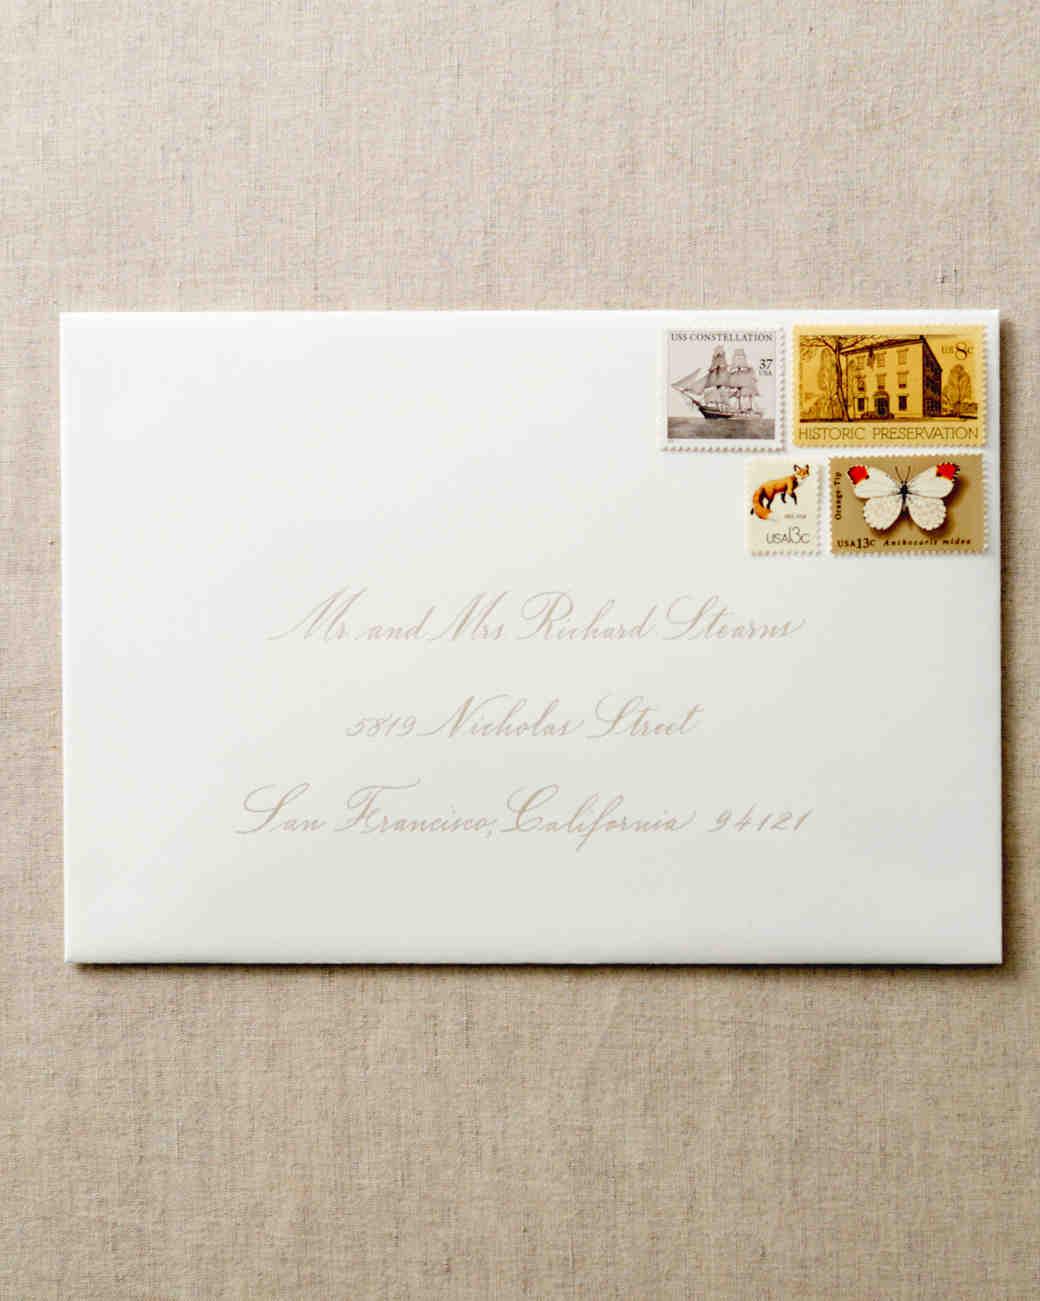 how to address wedding invitation envelopes wedding invitation envelopes To a Married Couple